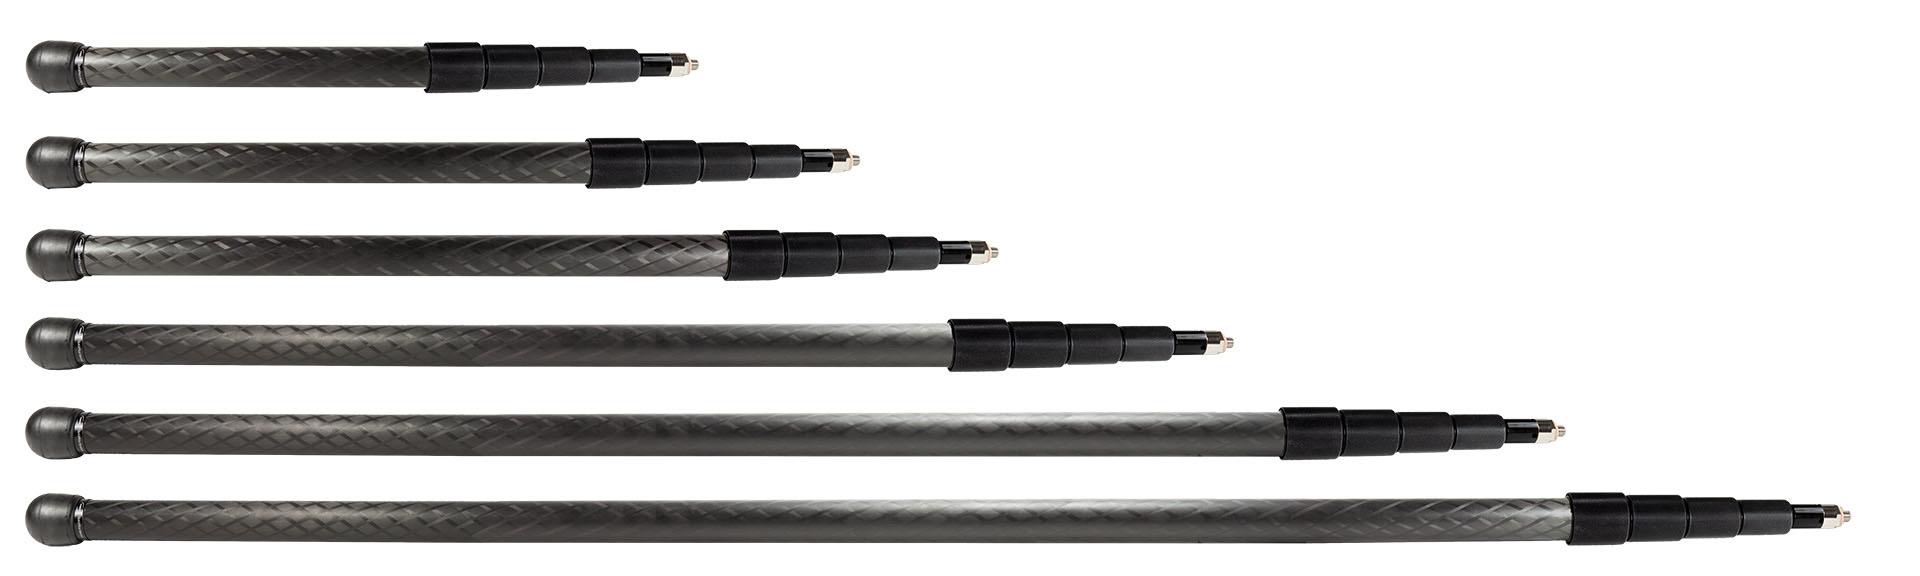 Ambient Ambient - QP5100 Series 5 - 101 - 392 cm